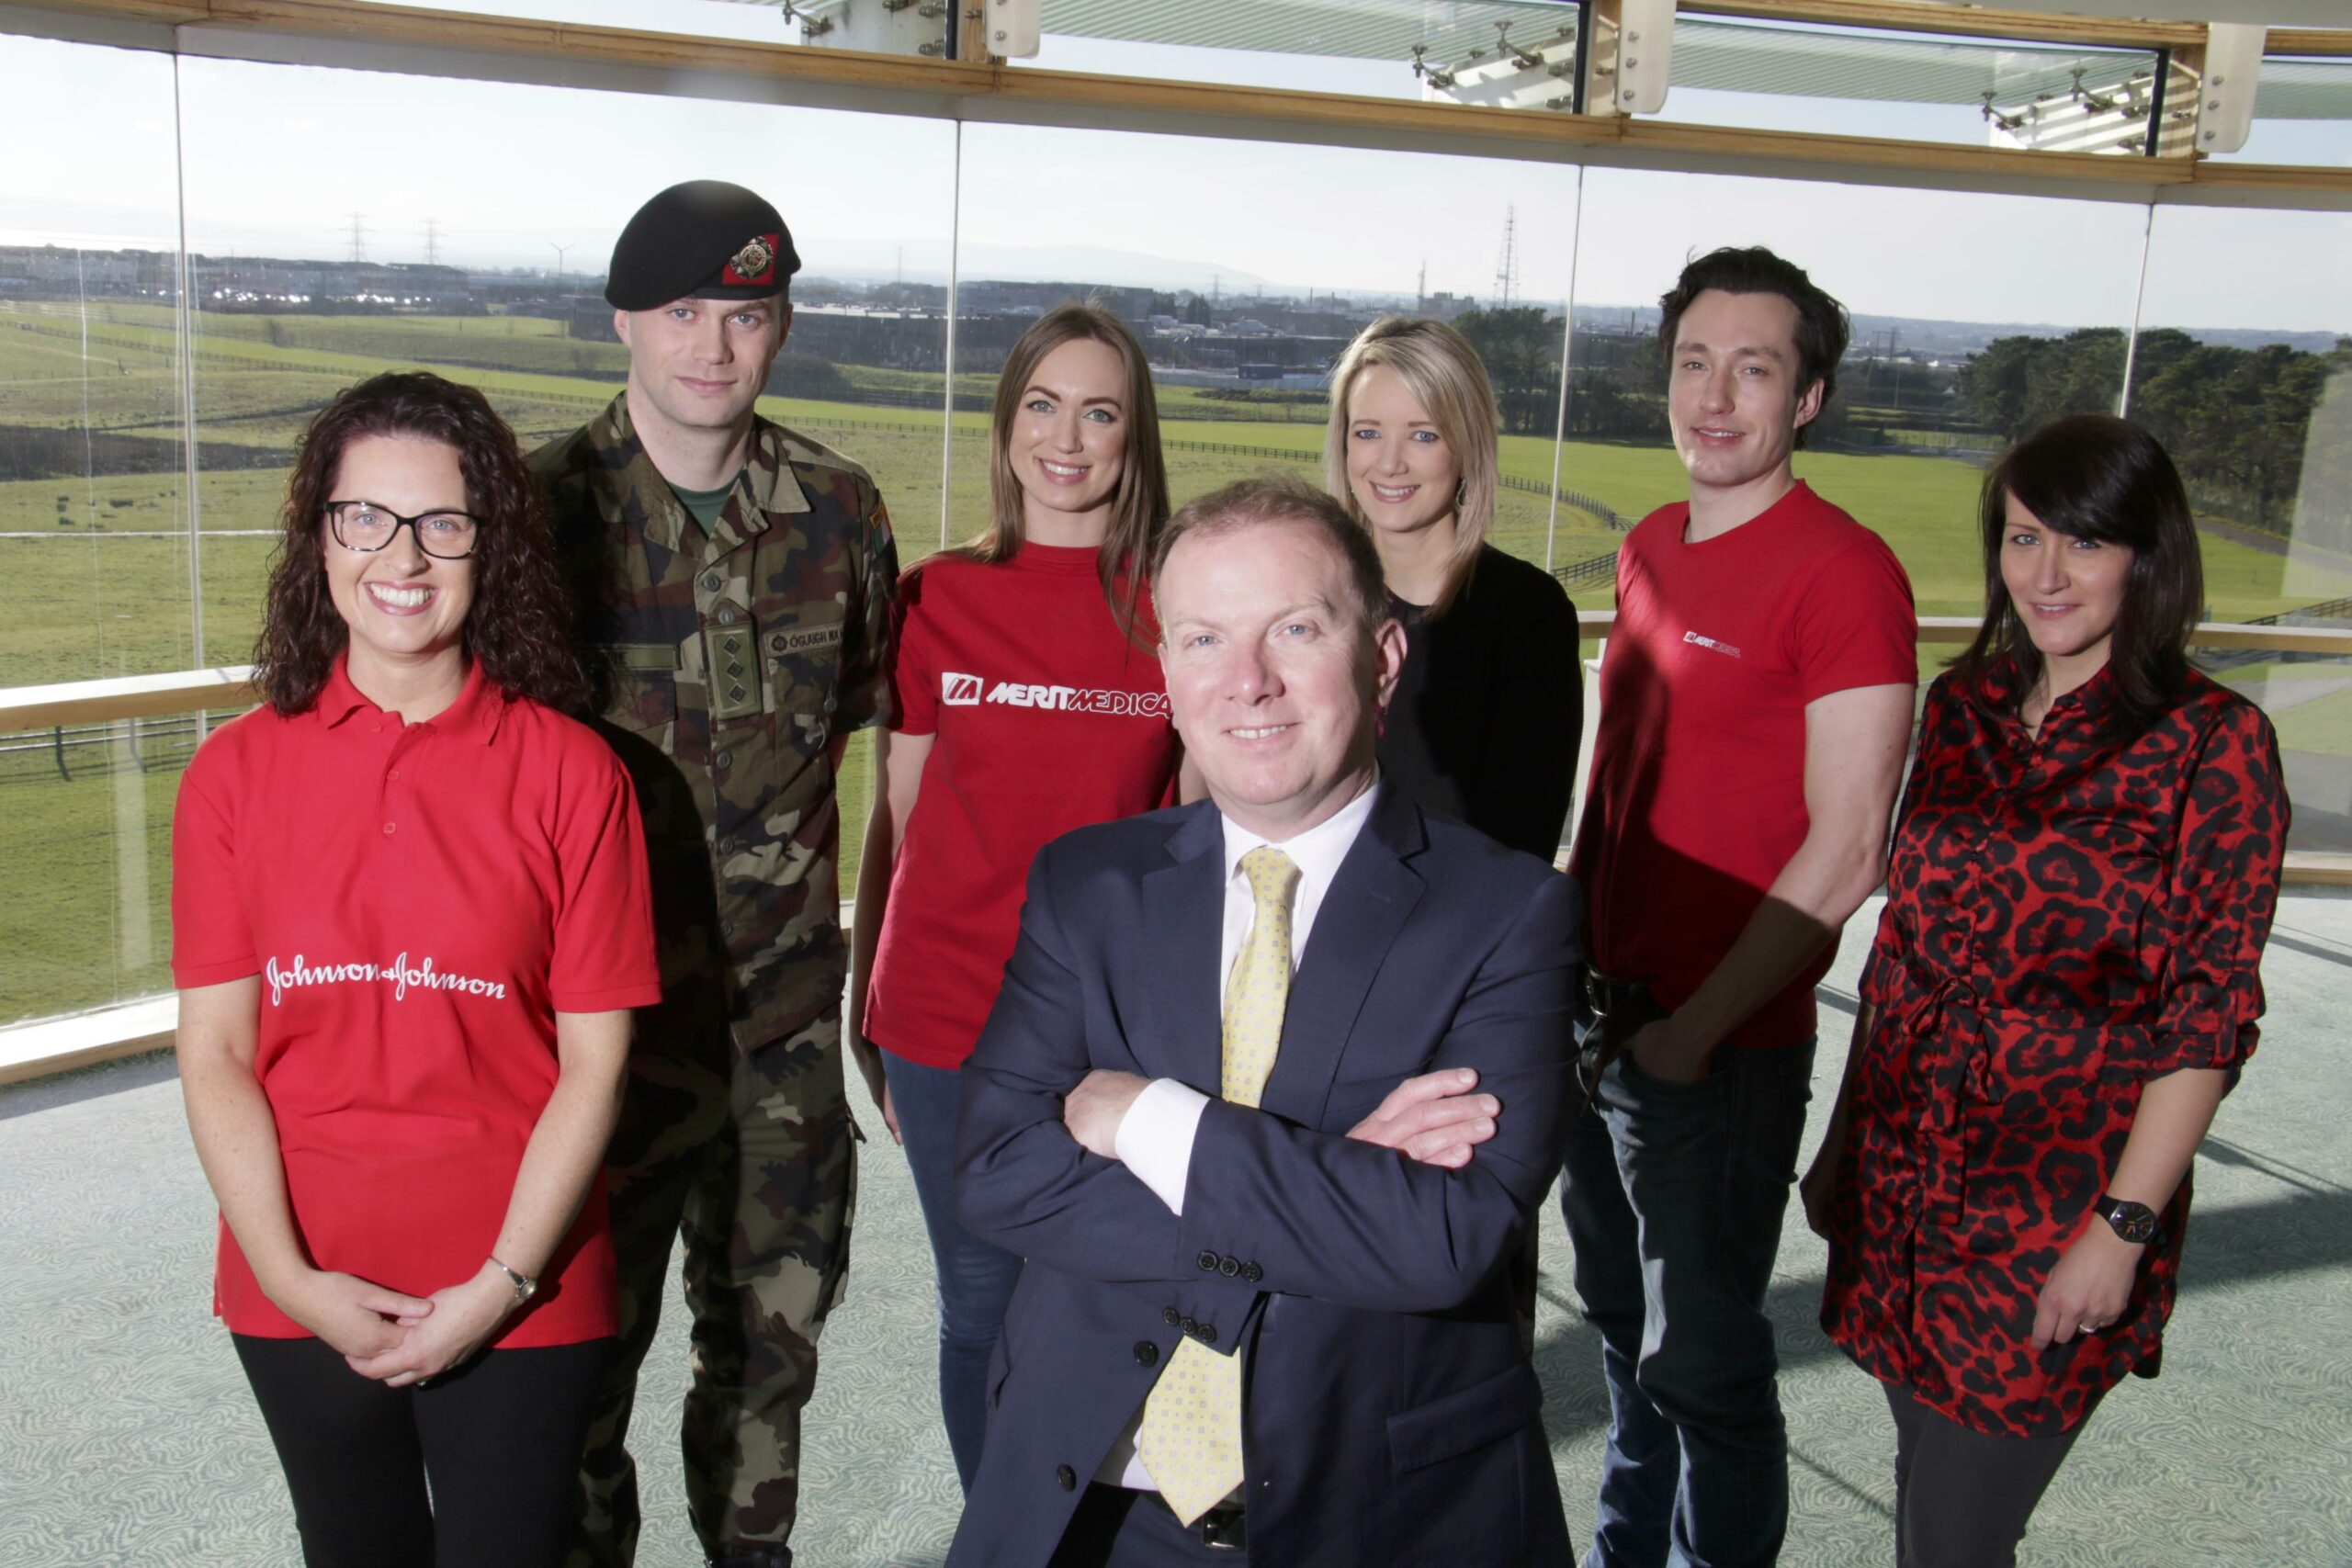 Survey reveals 45% of Galwegian jobseekers would rather work in Galway